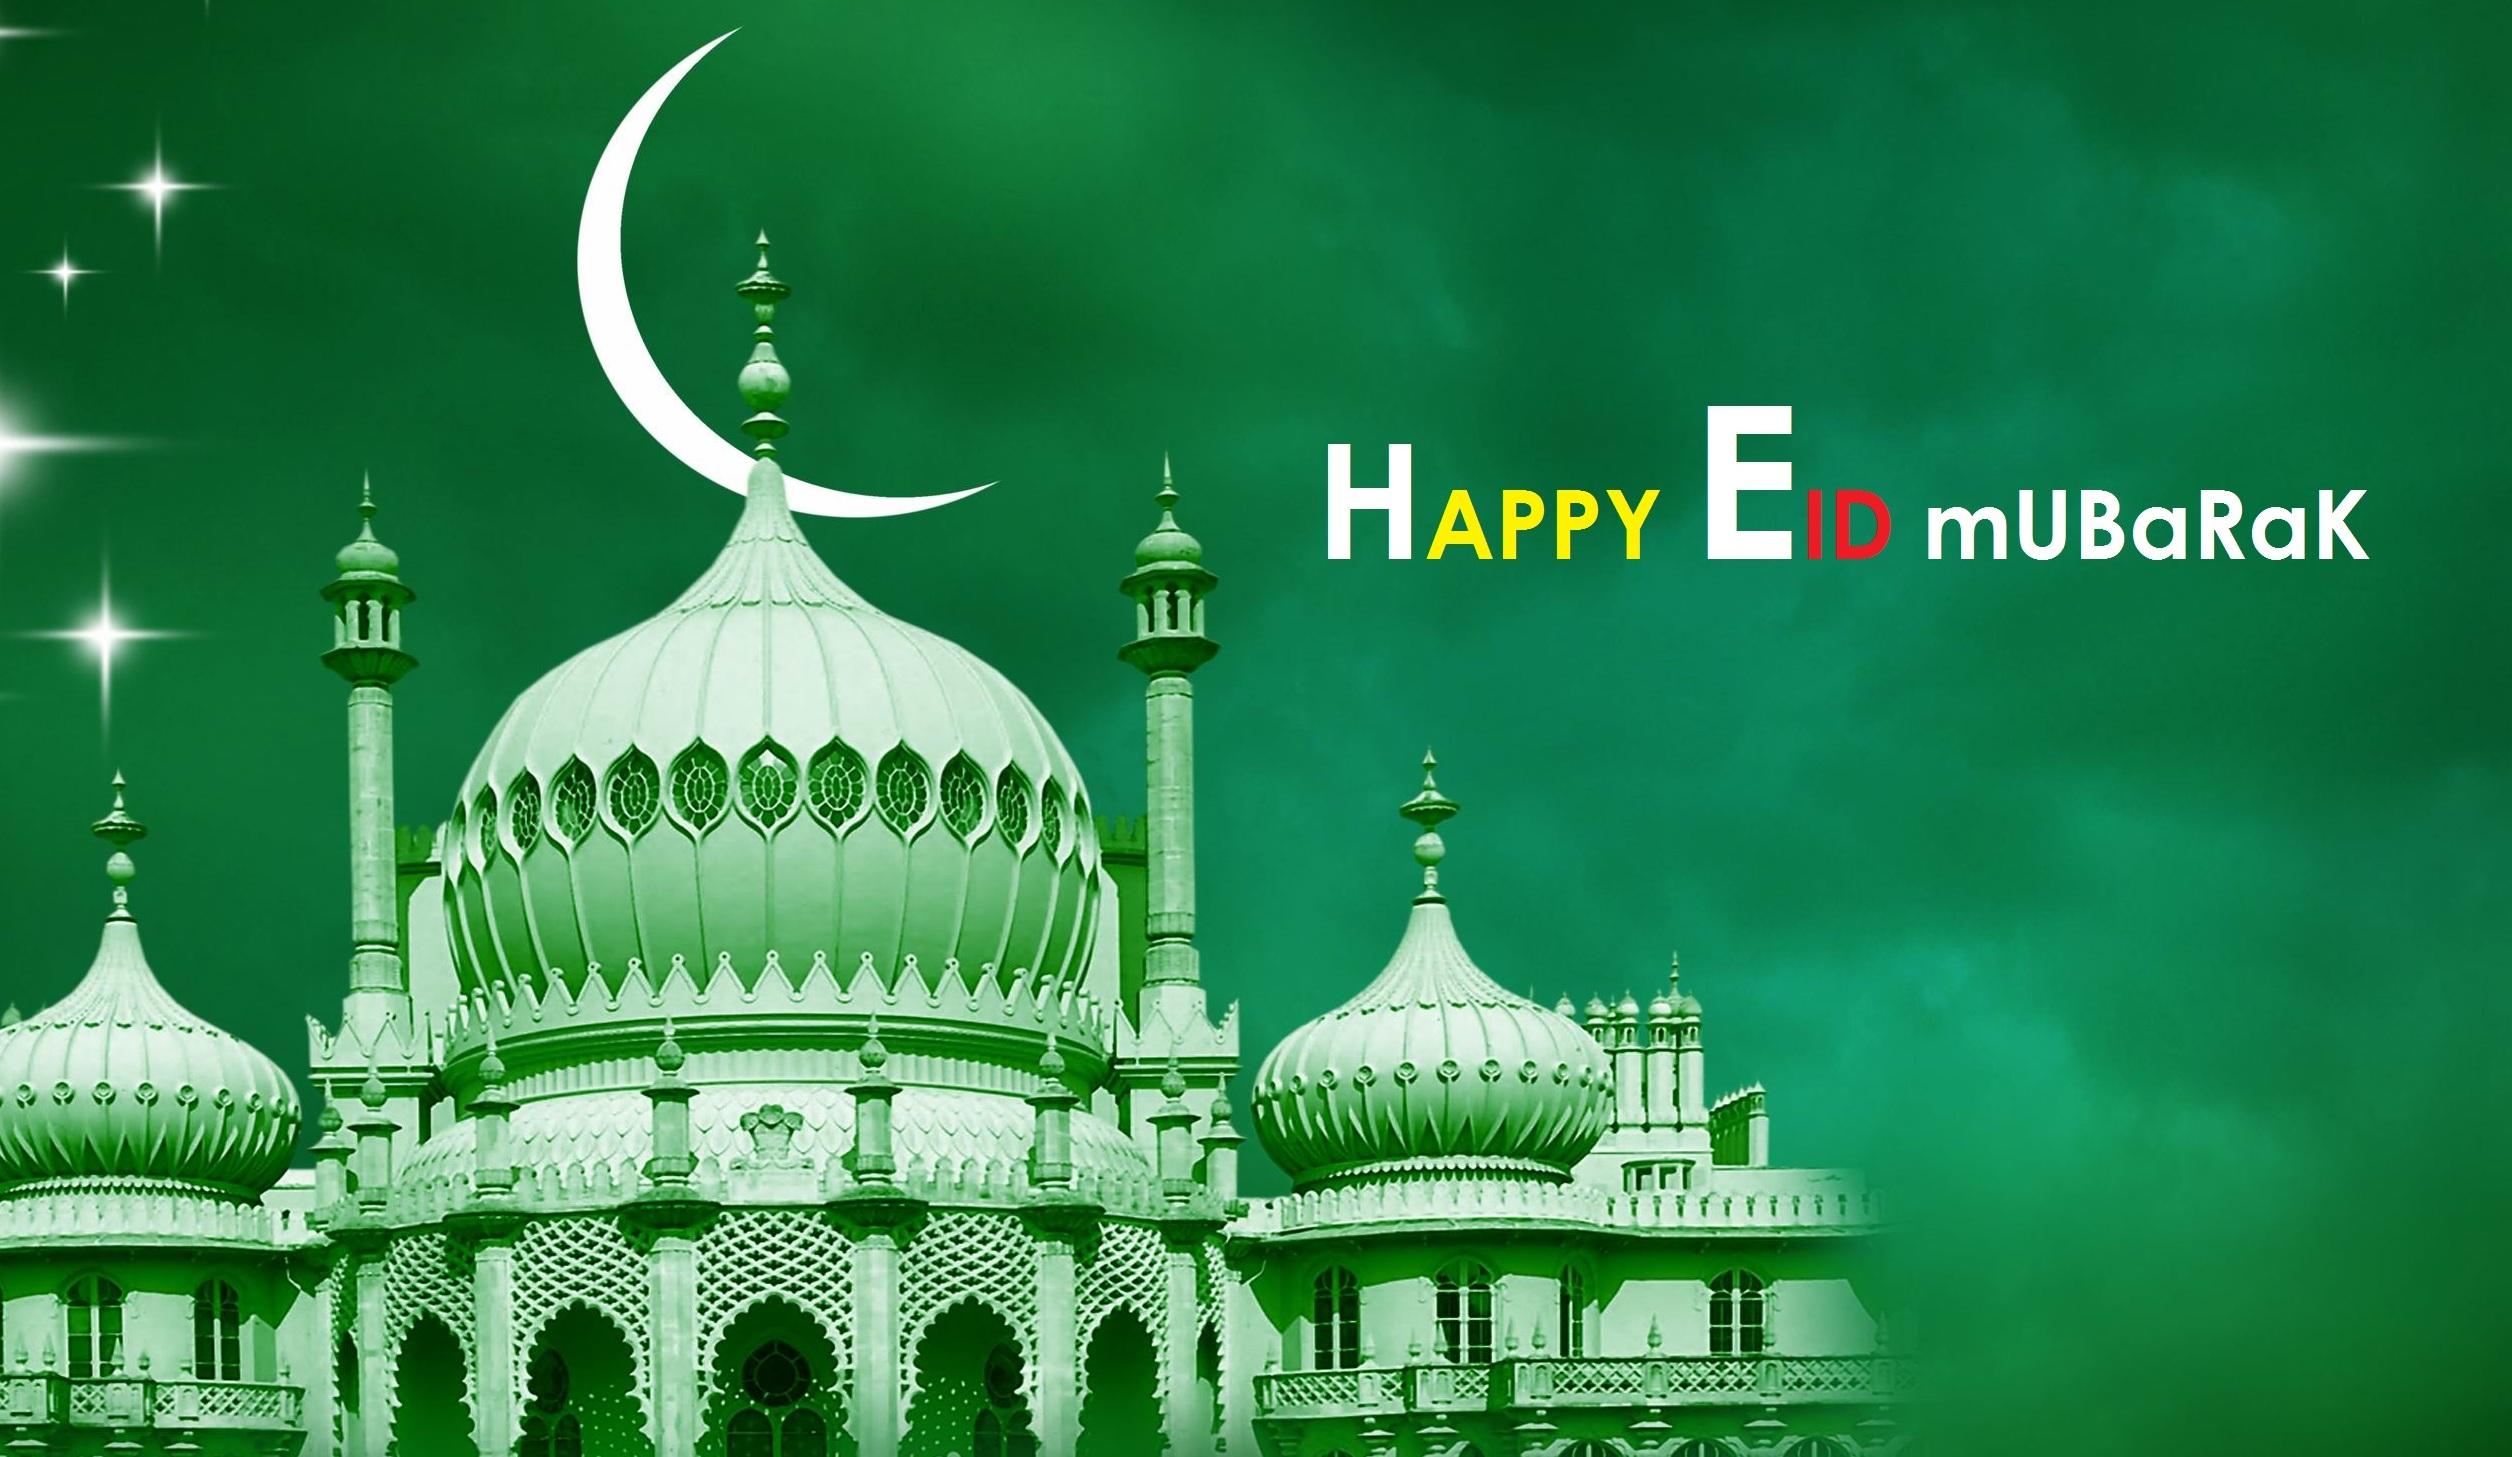 Eid Mubarak Greetings Wallpapers Xcitefun